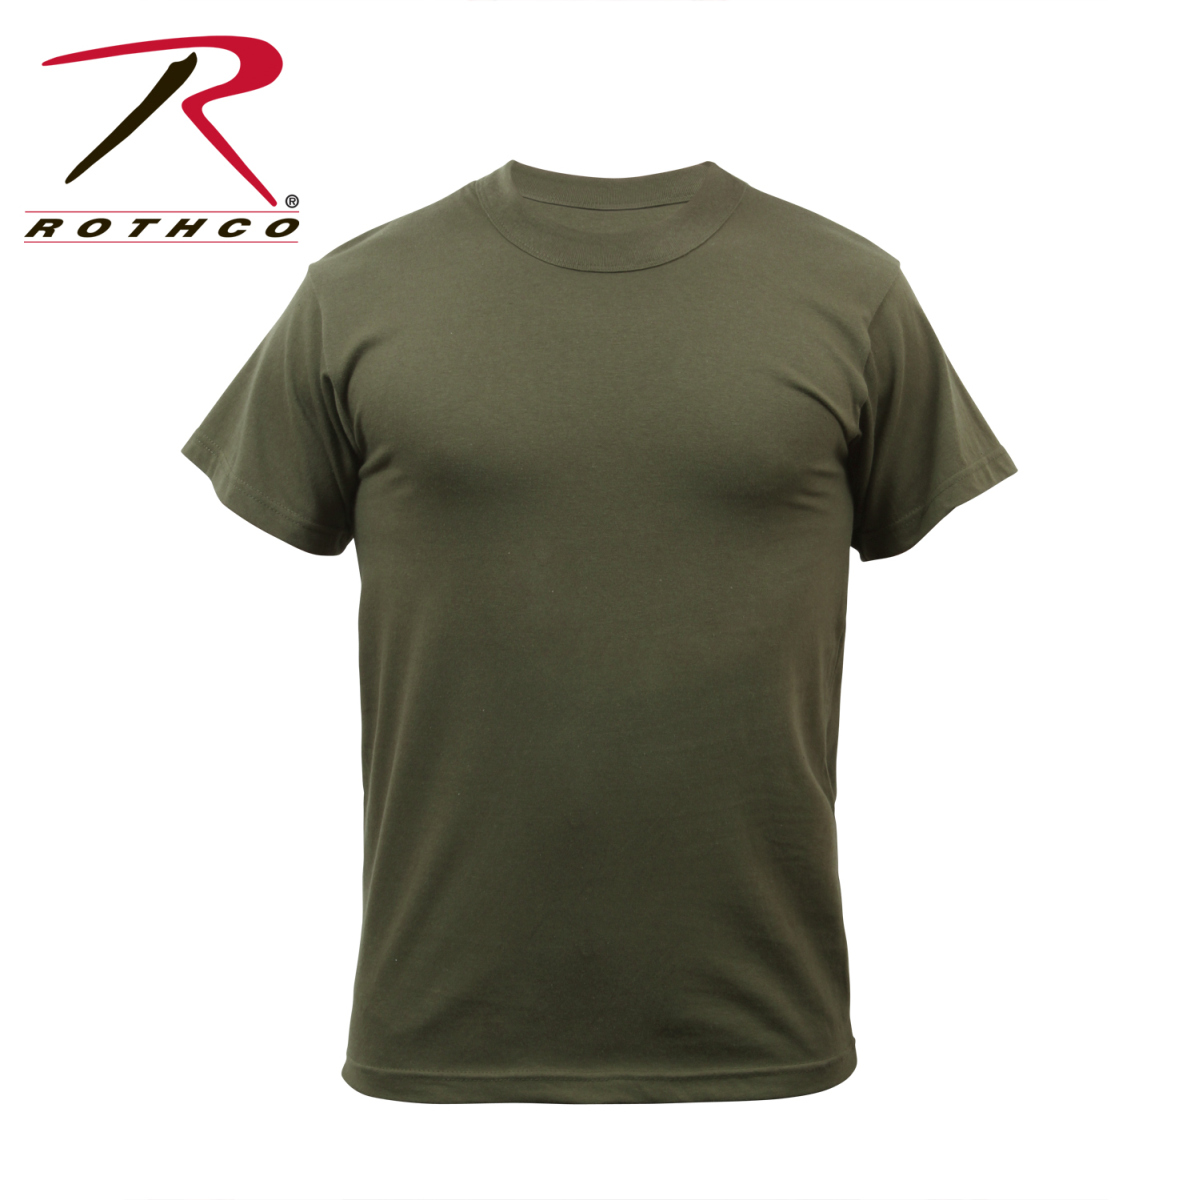 Buy Rothco Solid Color Polycotton Military T Shirt Rothco Online